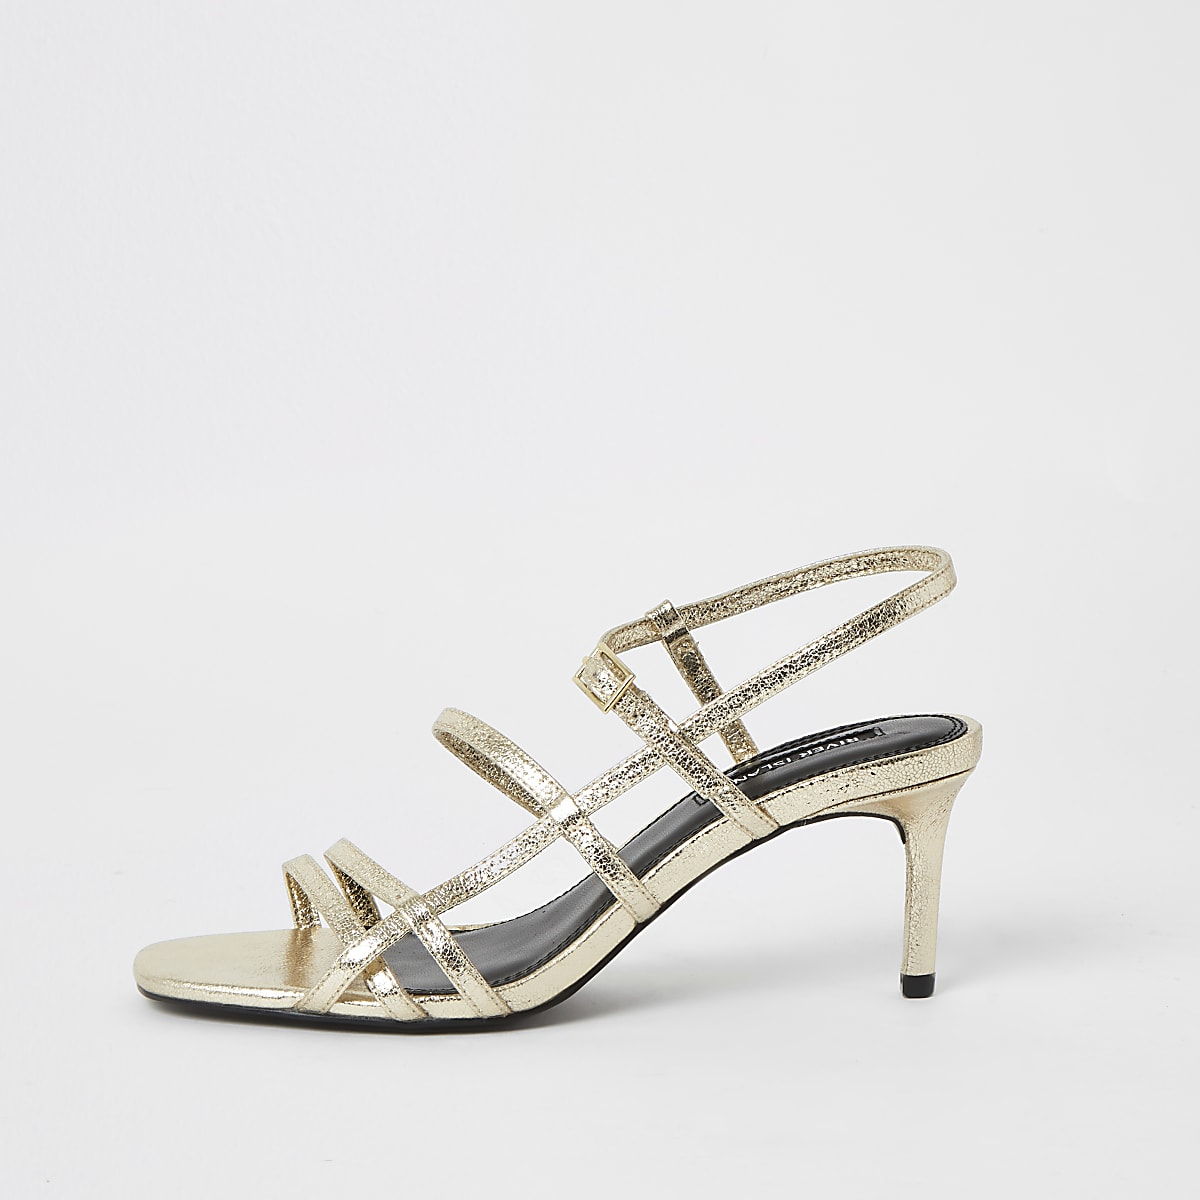 Gold metallic strappy skinny heel sandals